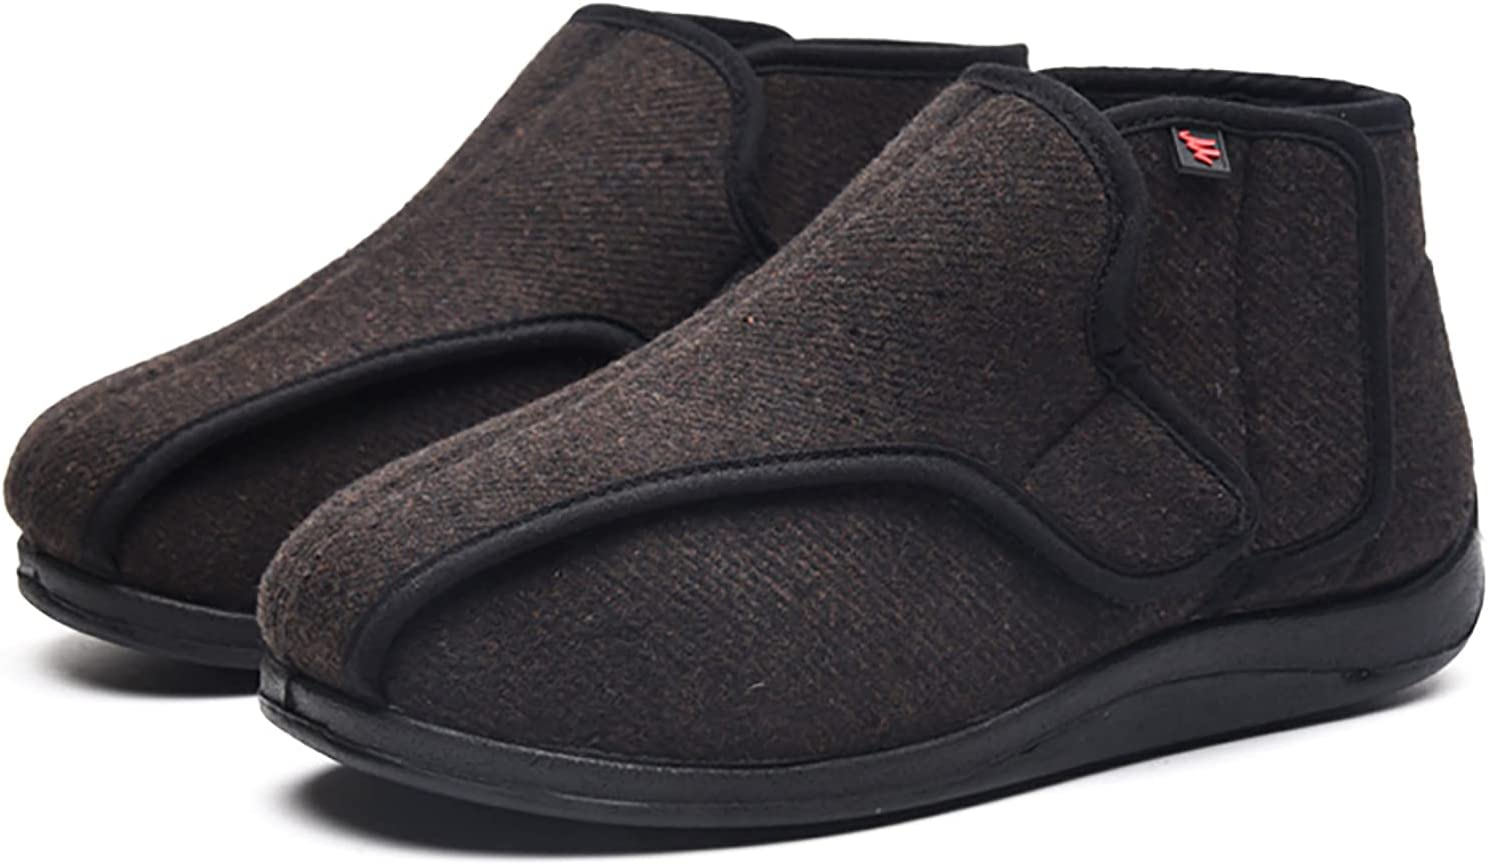 Unisex Diabetic latest Boots Adjustable Velcro Orth Jacksonville Mall Elderly Cloth Shoes